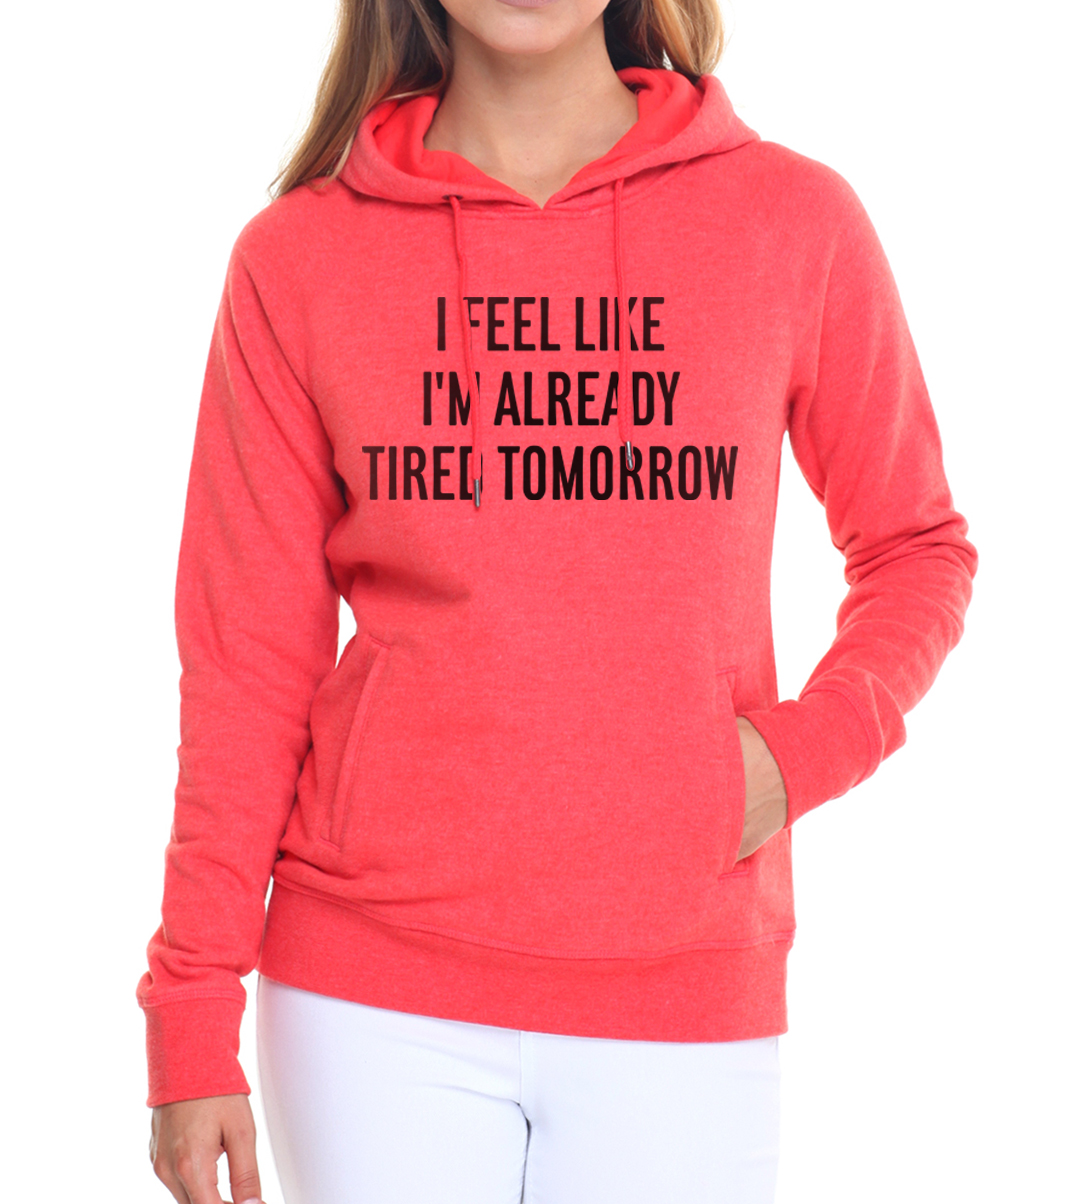 femme fashion fleece top sweatshirts pullovers 2019 brand harajuku tracksuits women I feel like i'm already tired tomorrow hoody